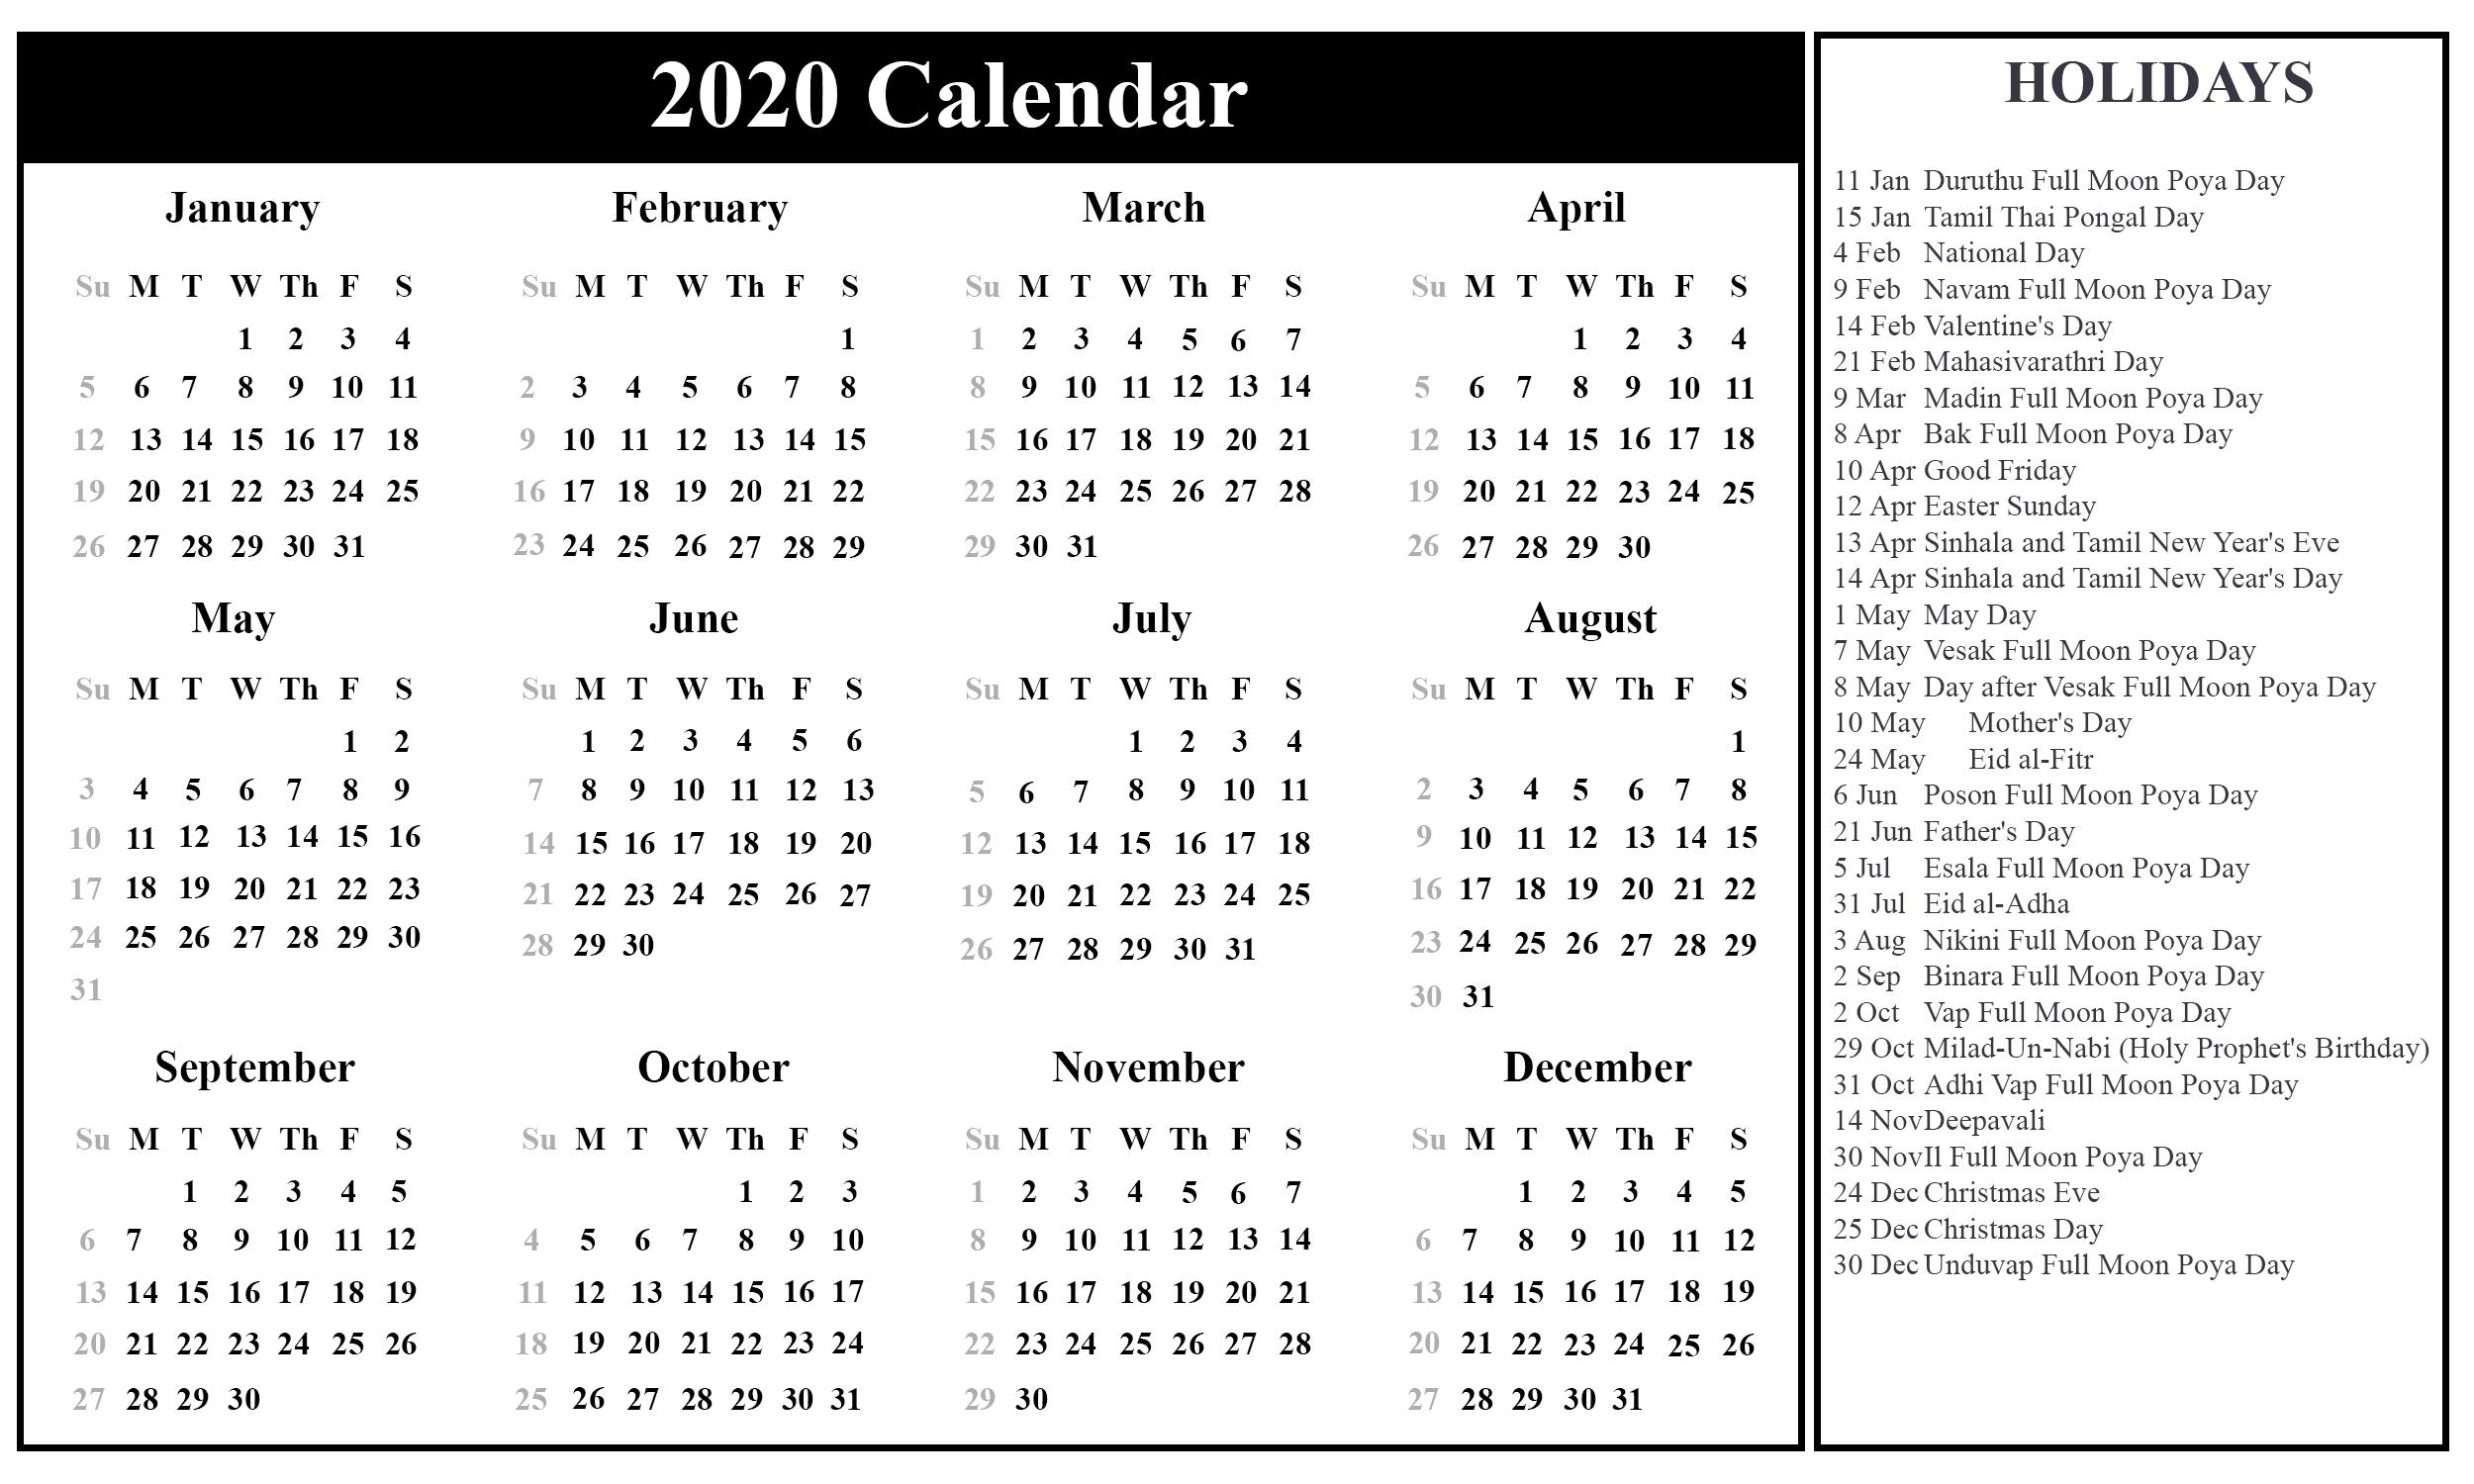 Free Printable Sri Lanka Calendar 2020 With Holidays In Pdf-2020 Islamic Calendar Holidays